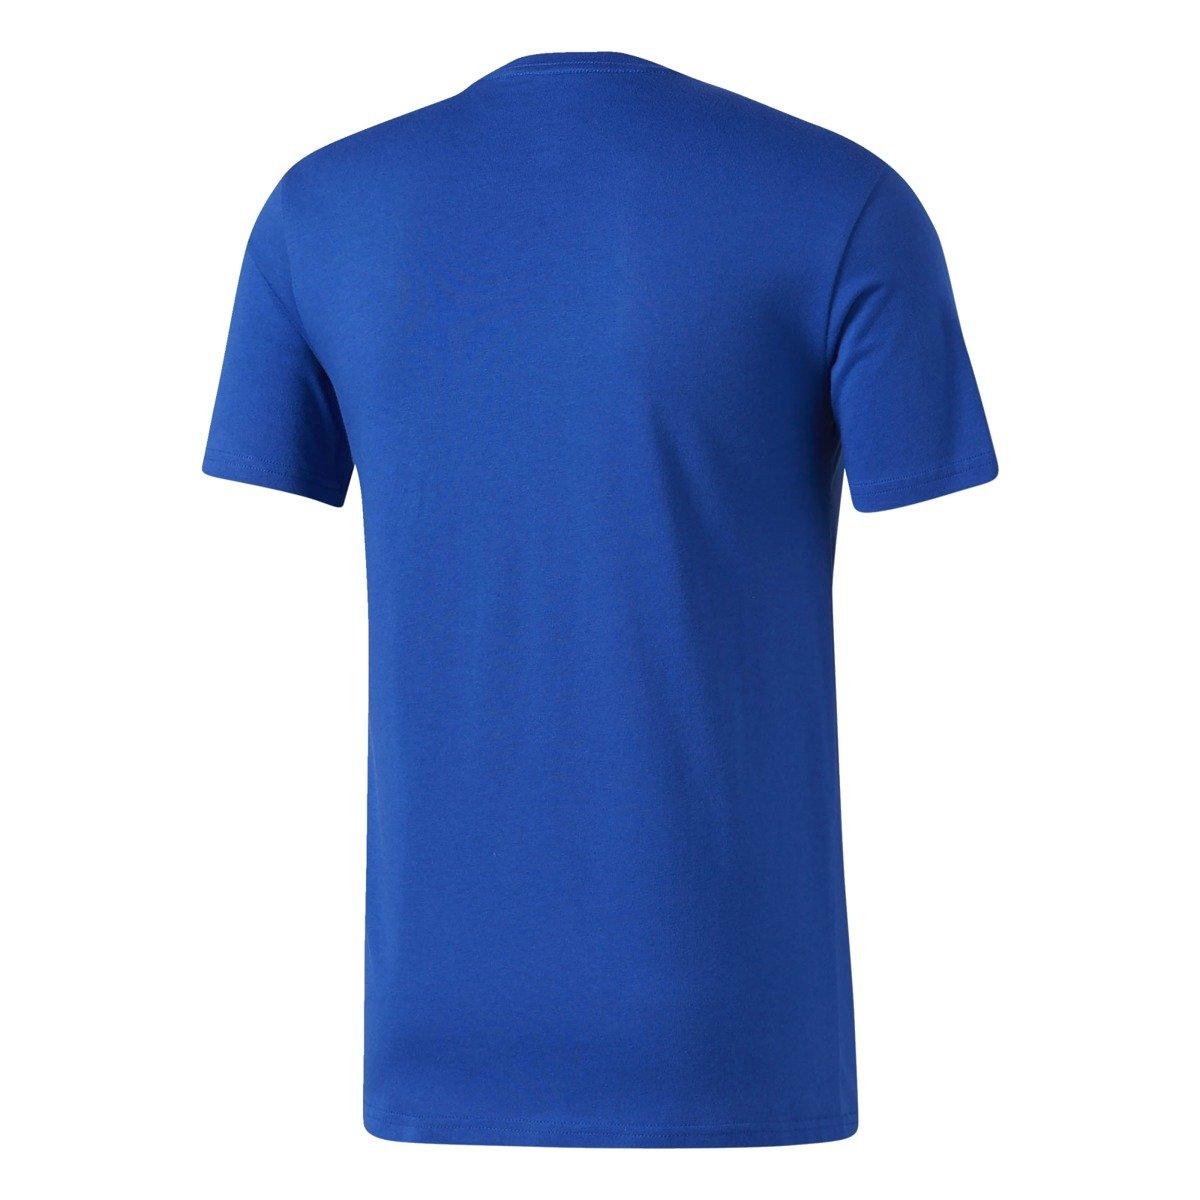 Adidas nba golden state warriors t shirt s96787 for Adidas custom t shirts